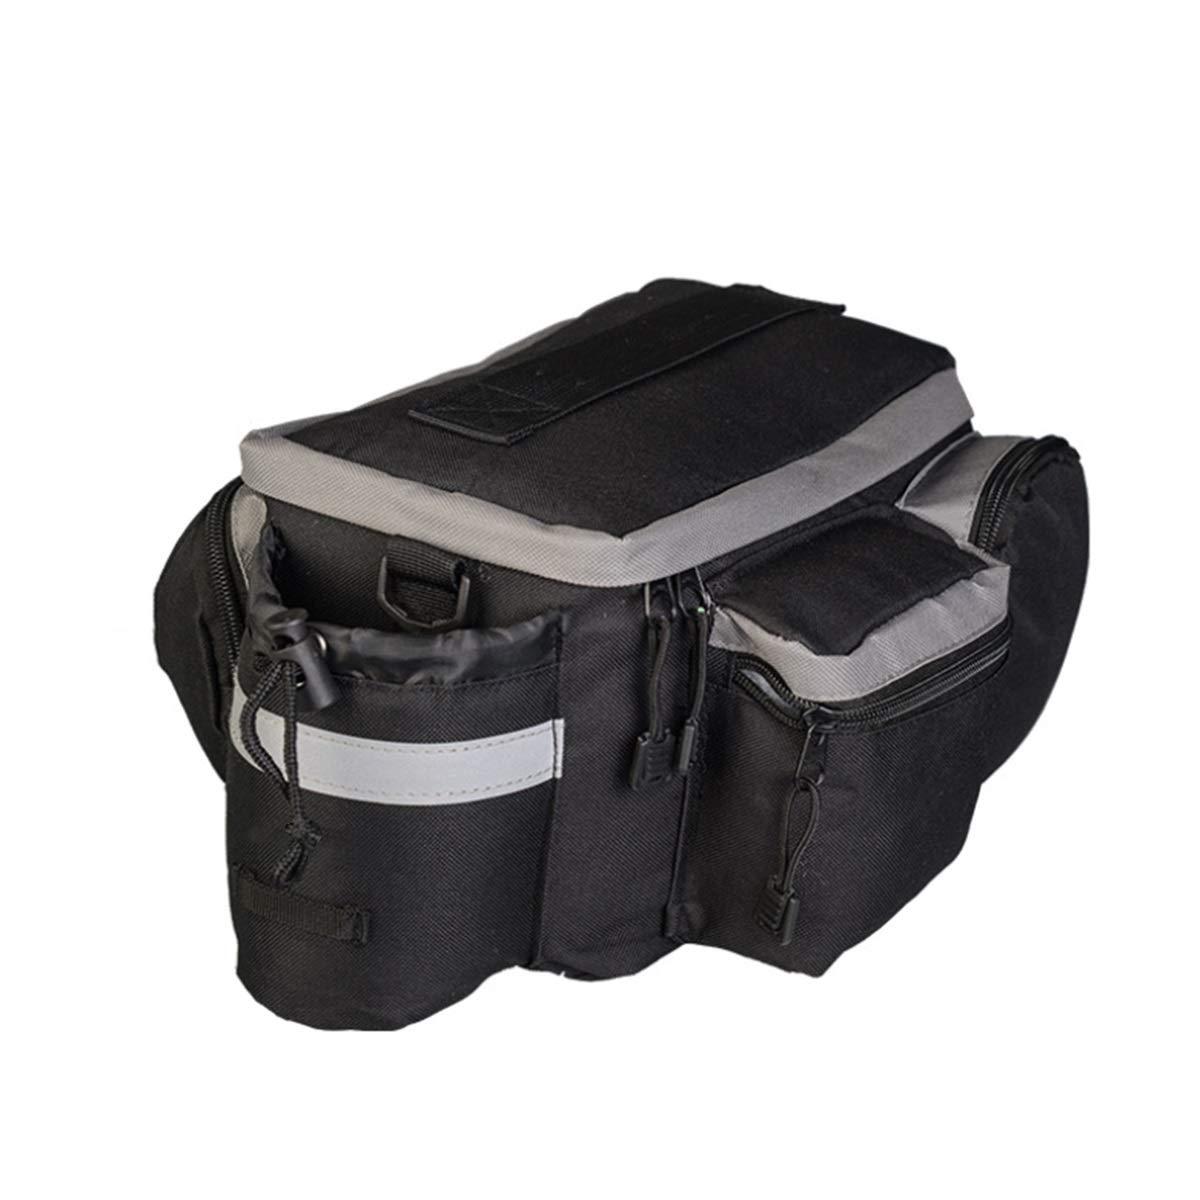 6L Bike MTB Trunk Bag with Reflective Strip Bicycle Trunk Rear Handbag Cycling Storage Rack Pack by Tianhaik